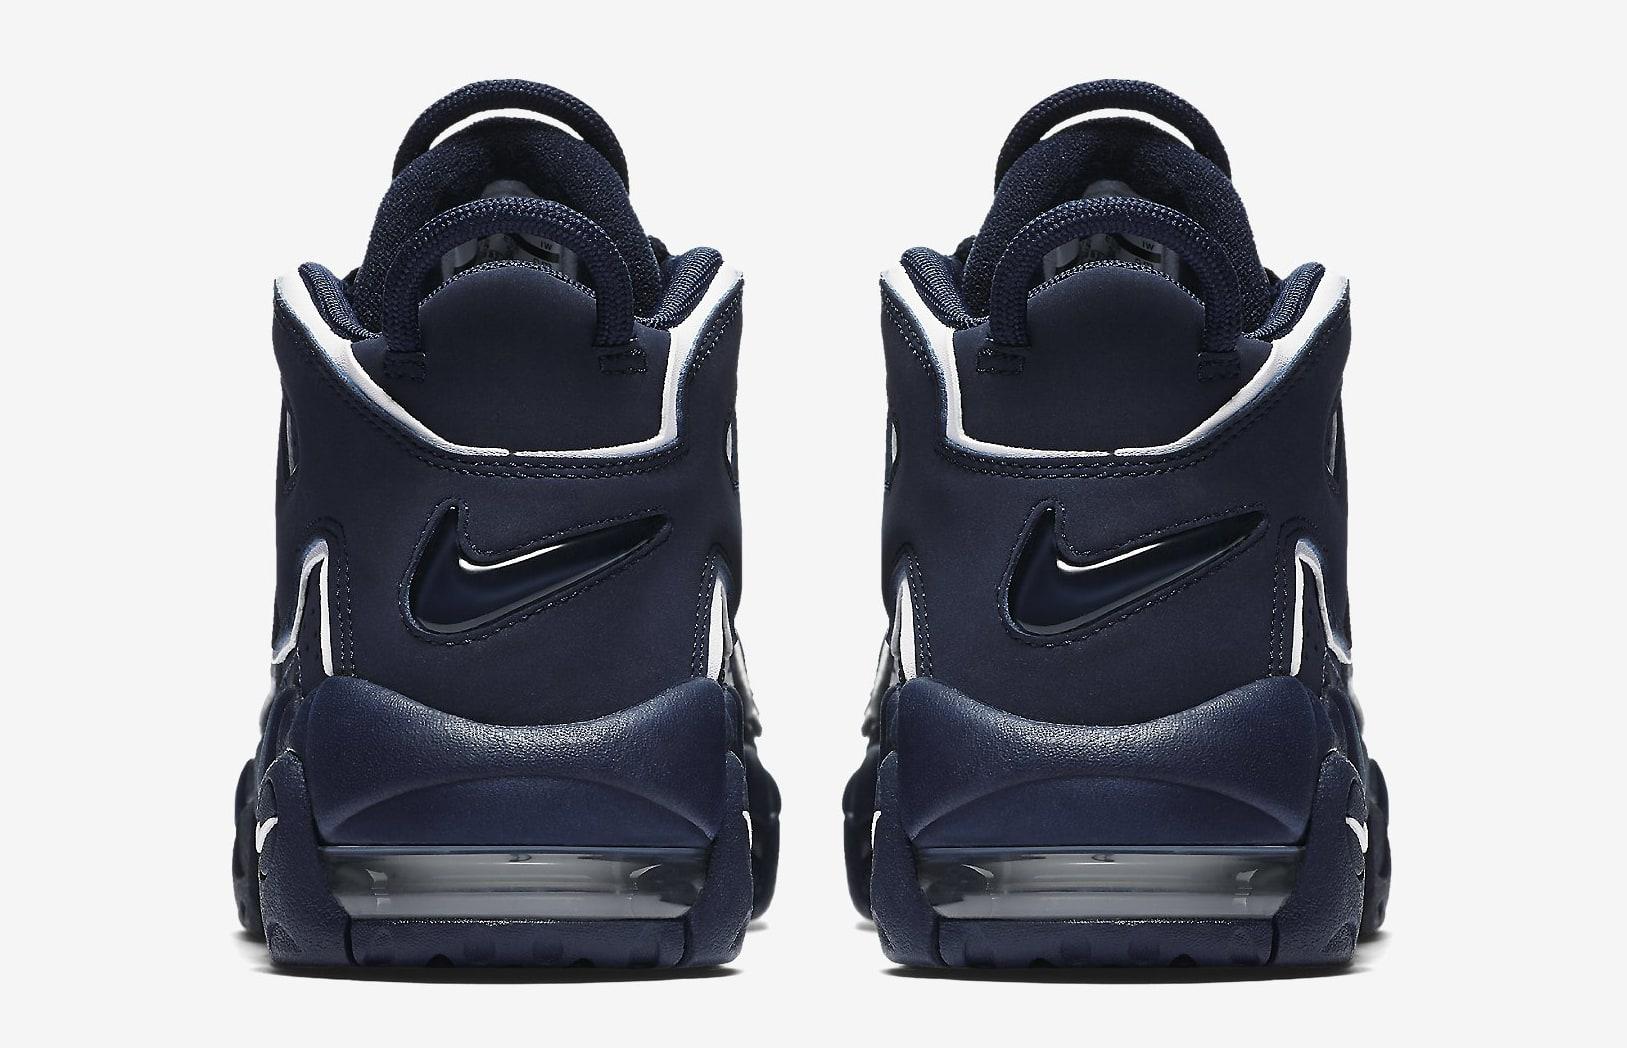 Nike Air More Uptempo Midnight Navy